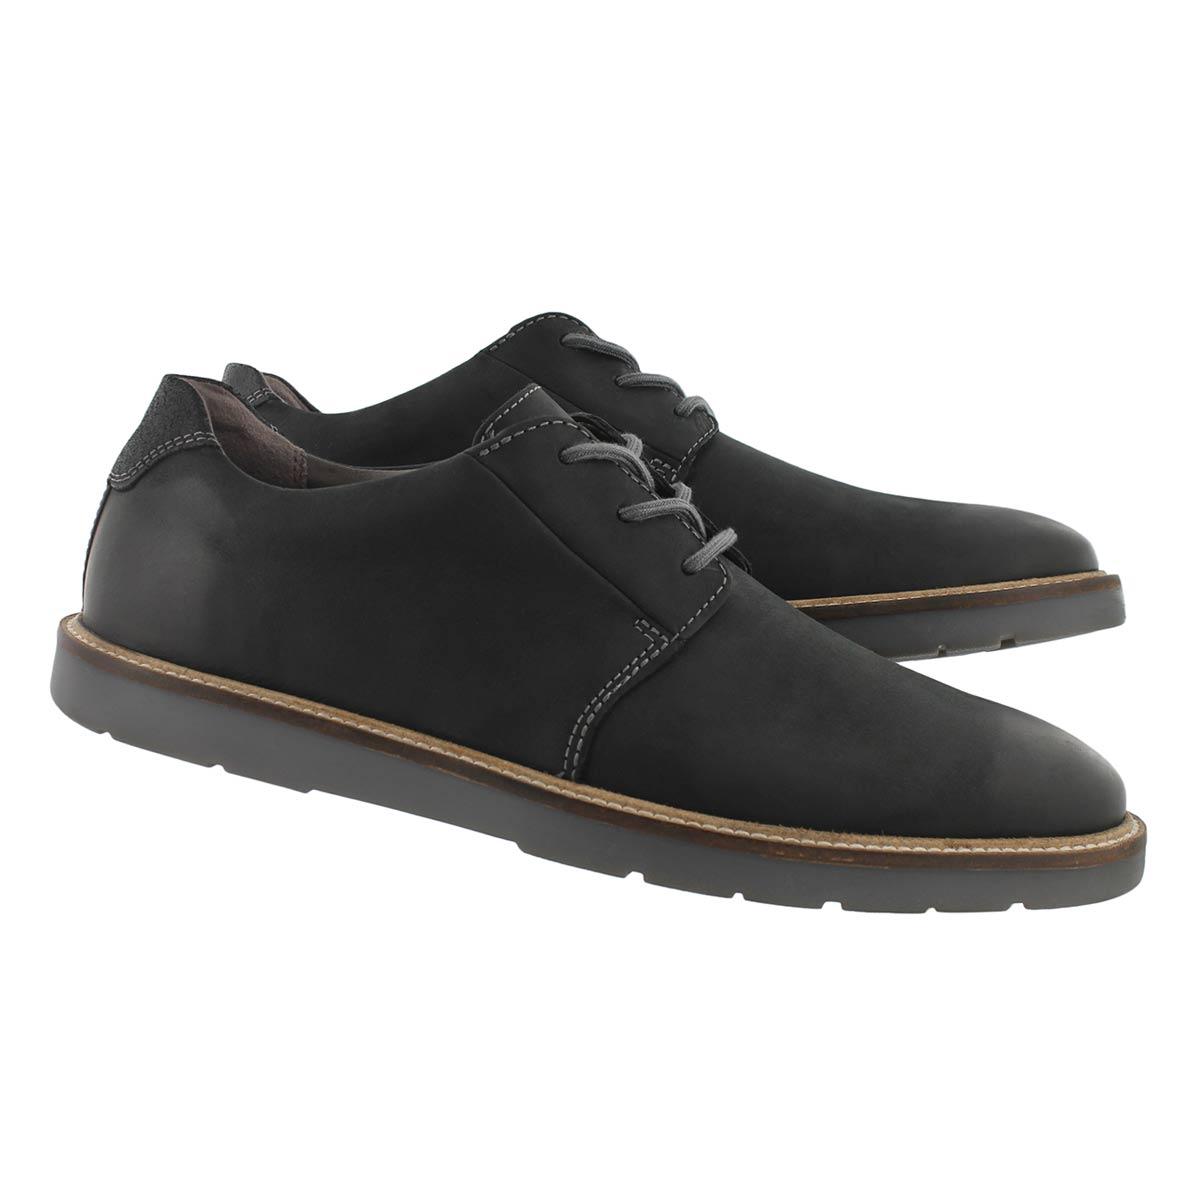 Men's Grandin Plain Casual Oxford - Black